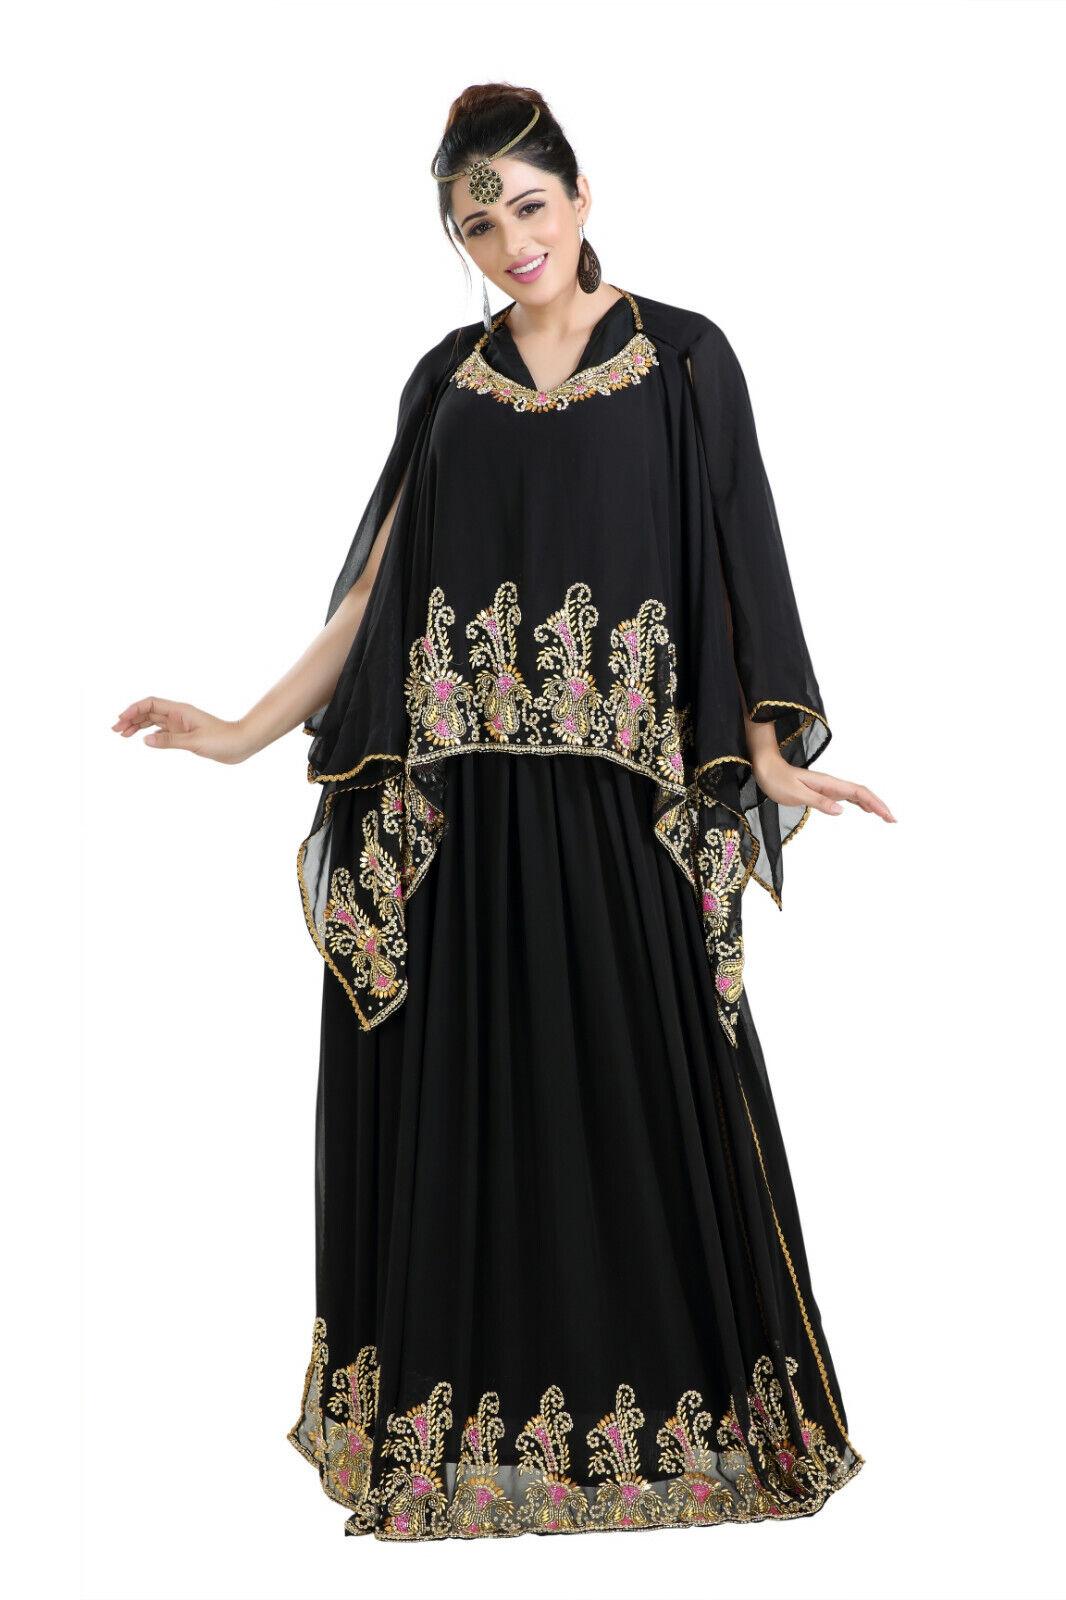 COMFORTABLE DUBAI FARASHA RHINESTONE CUSTOMIZED LADIES IRANIAN MAXI DRESS 8167